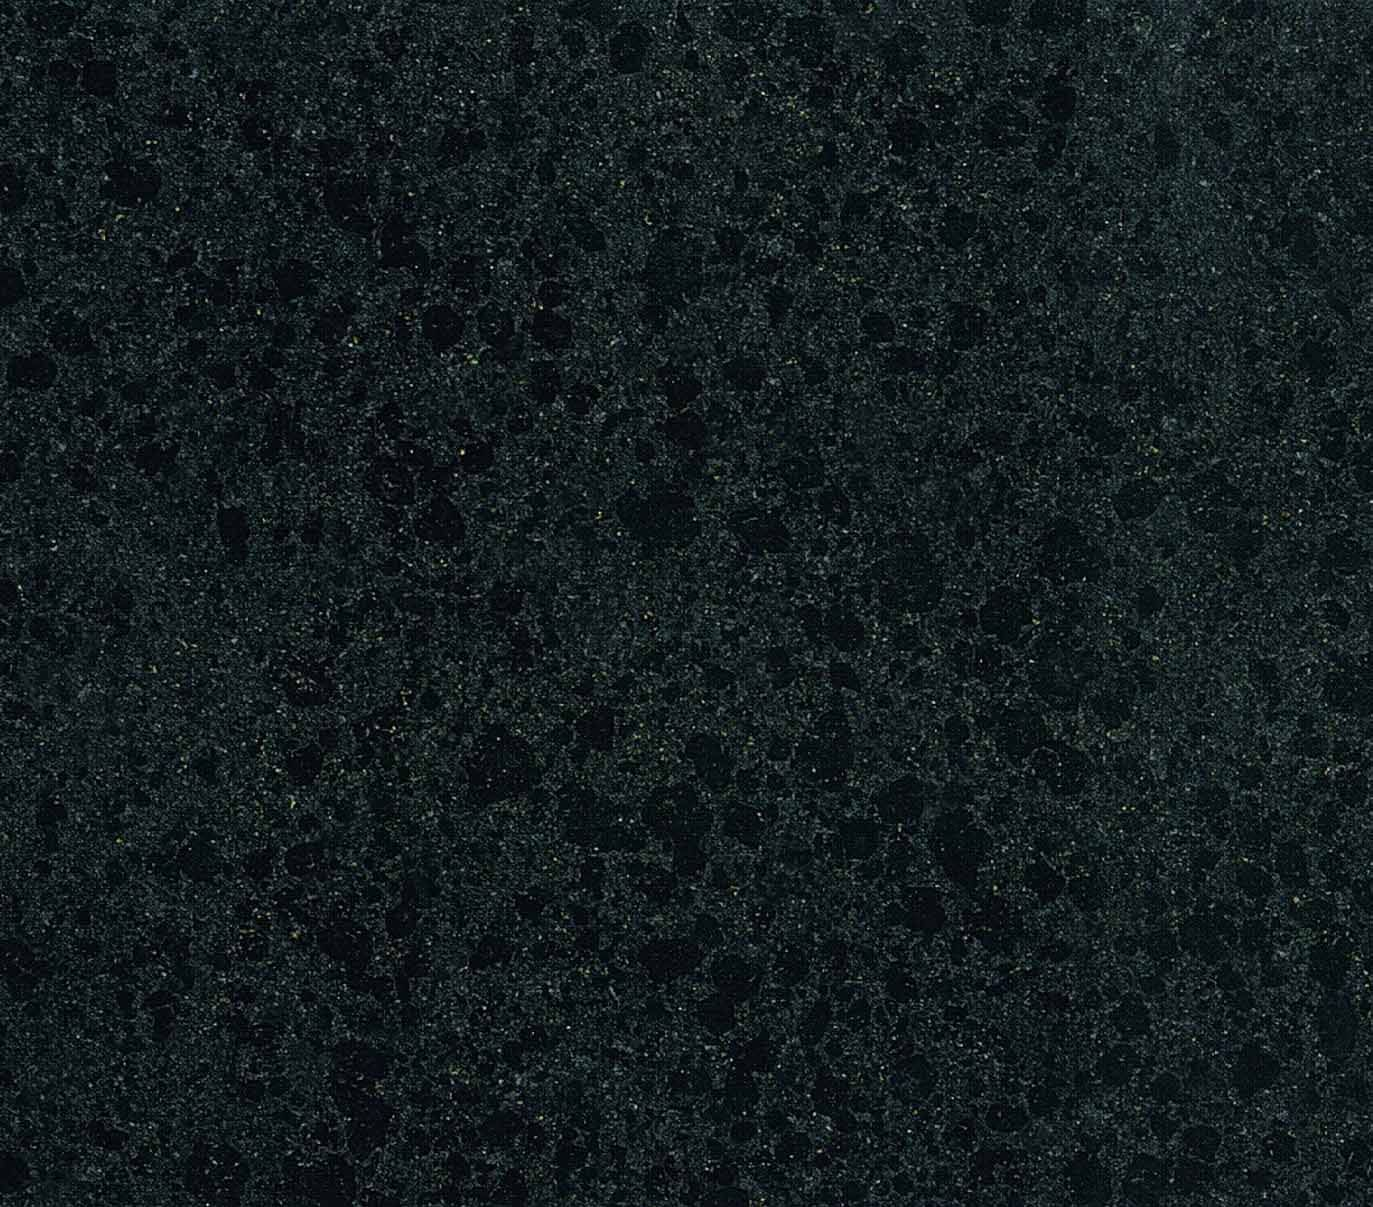 Granito negro brasil contactanos a ventas for Colores de granito negro